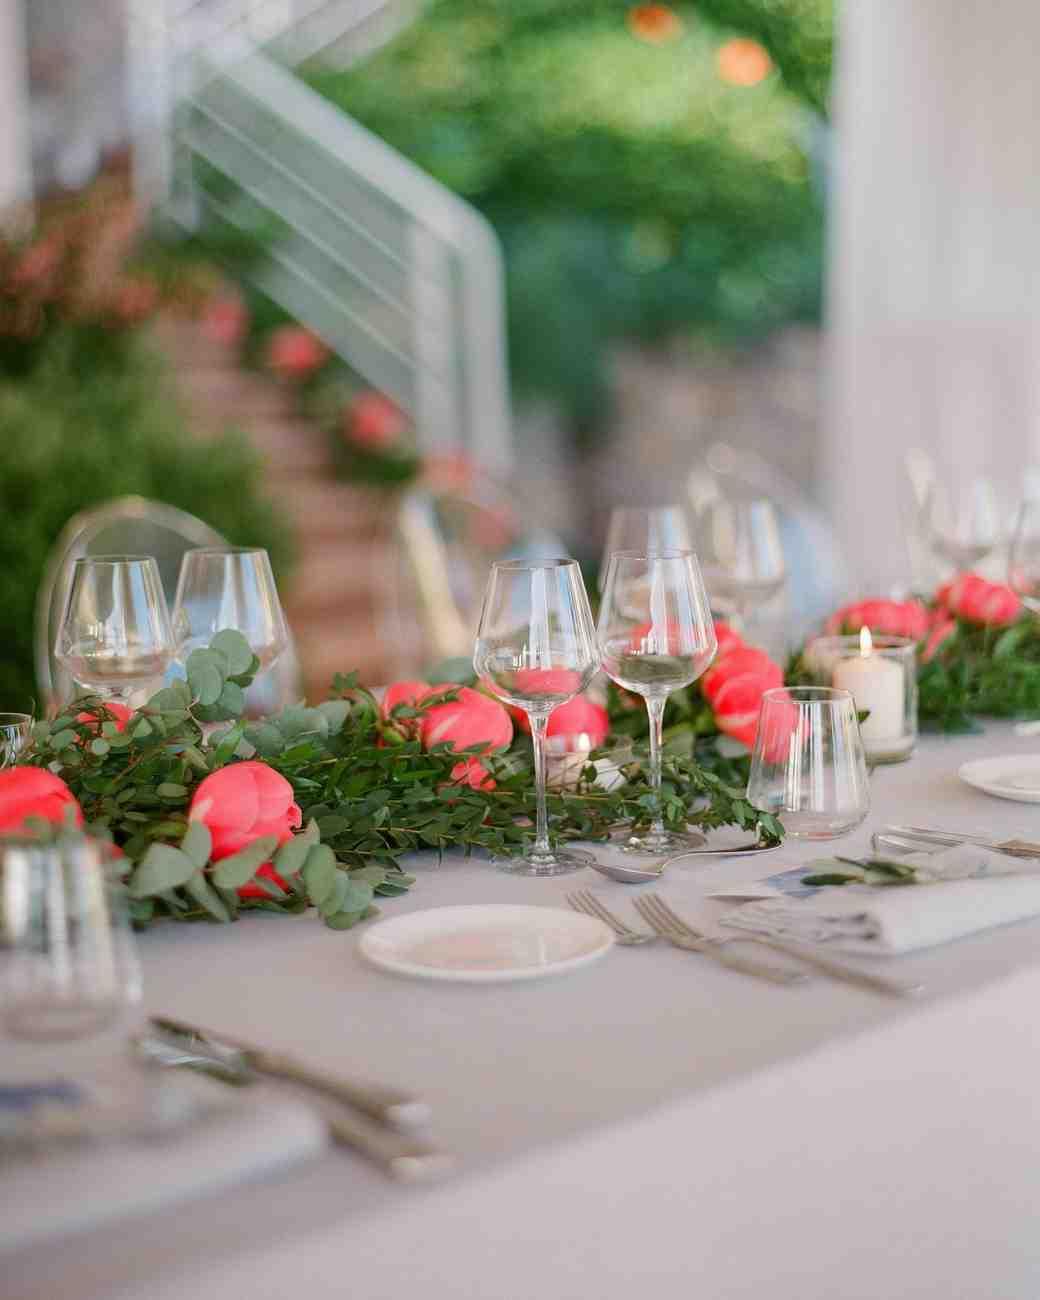 36 simple wedding centerpieces martha stewart weddings rh marthastewartweddings com Cute Wedding Centerpiece Ideas Wedding Reception Table Decorations